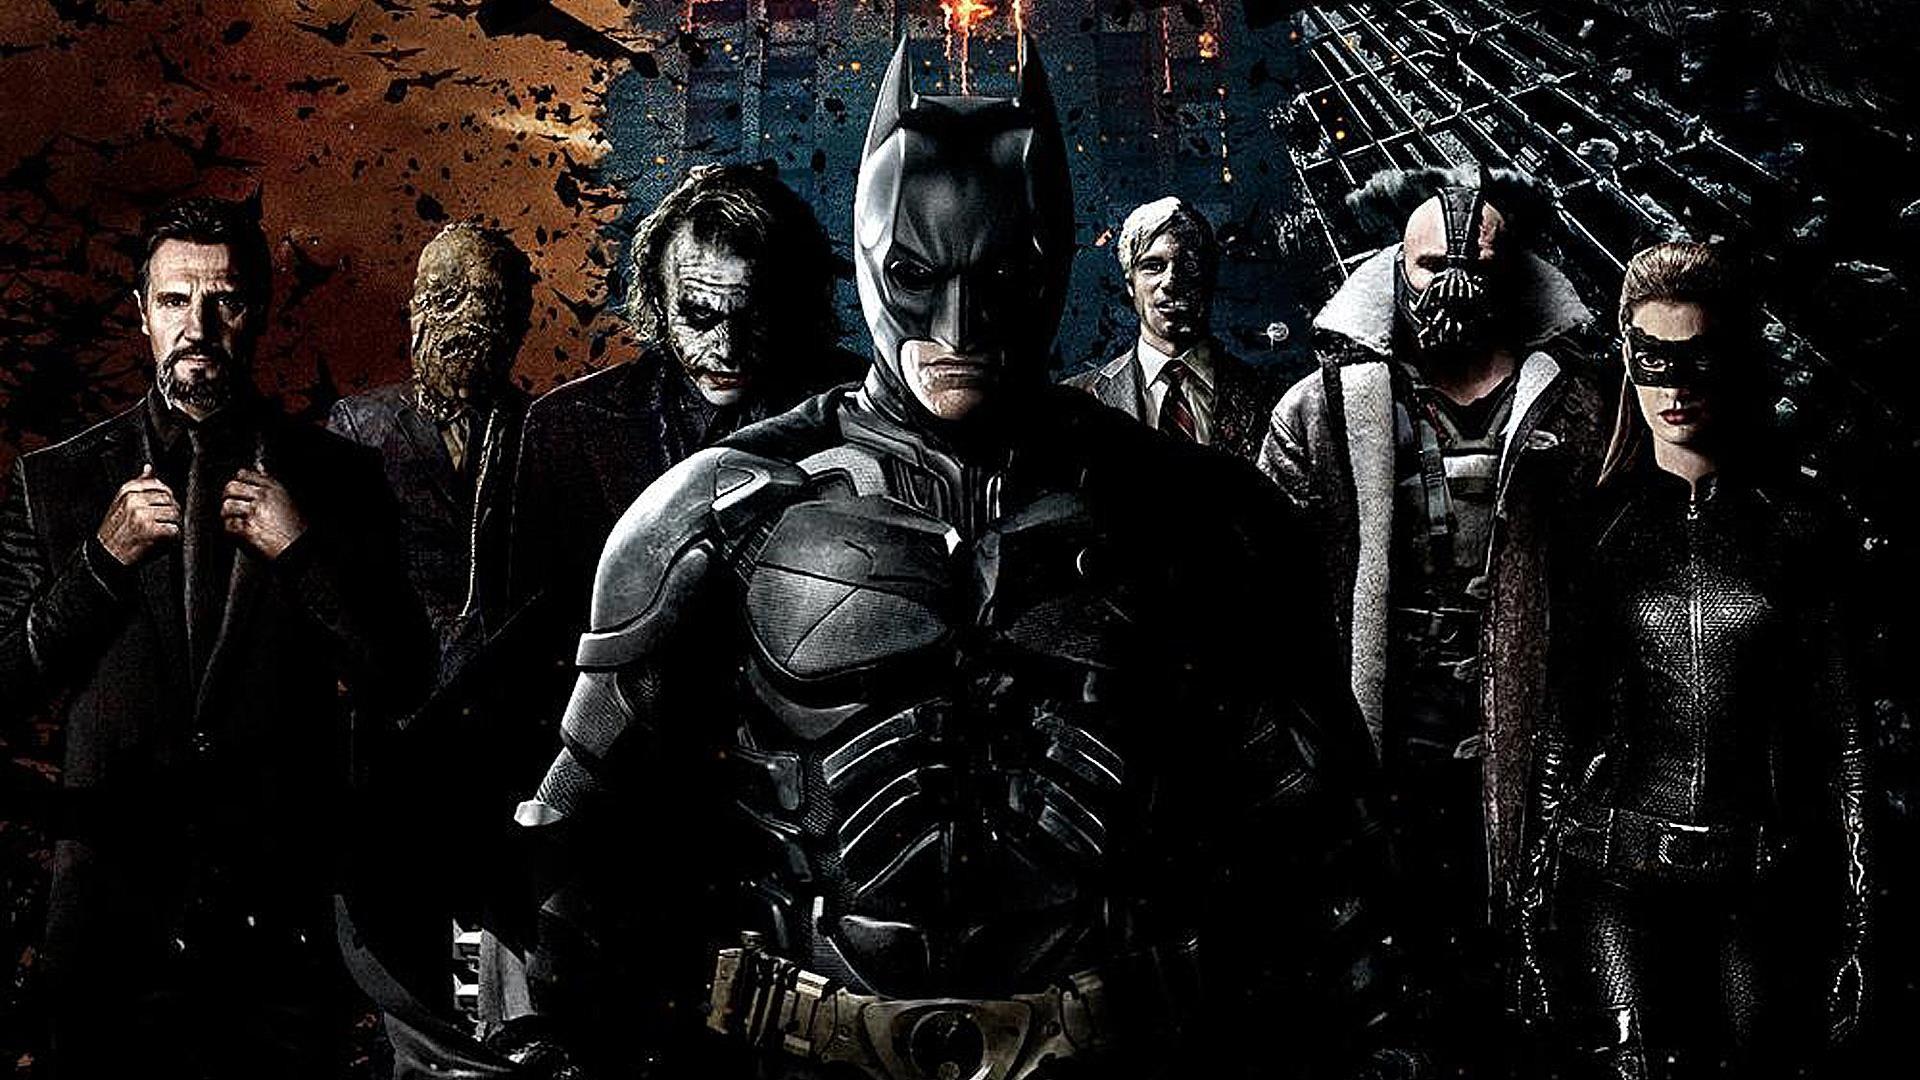 batman knight dark returns wallpapers desktop cave